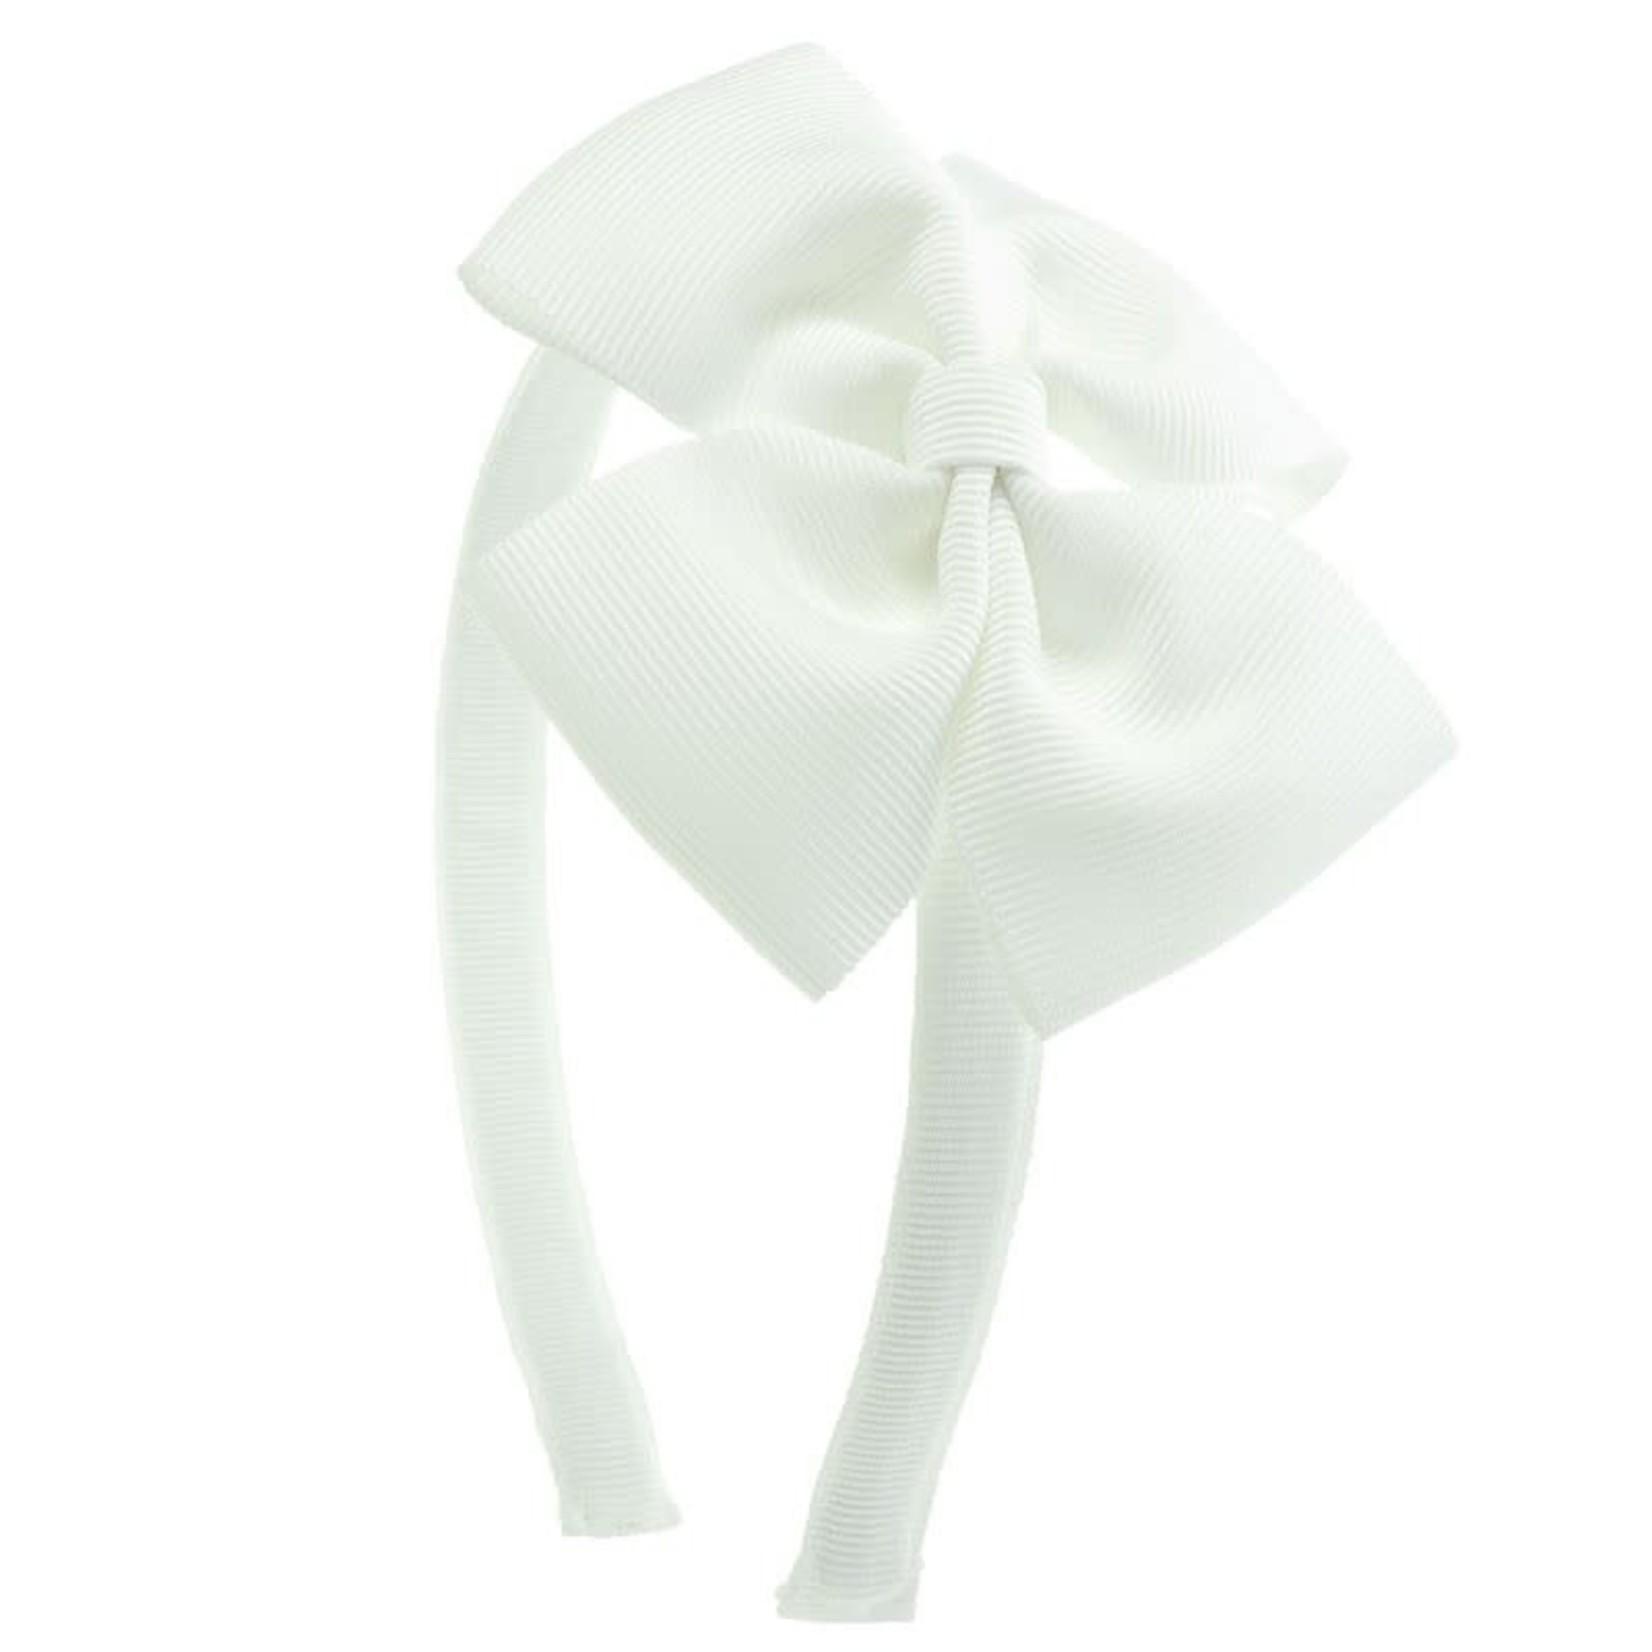 Siena Diadeem Butterfly Perfect  - White